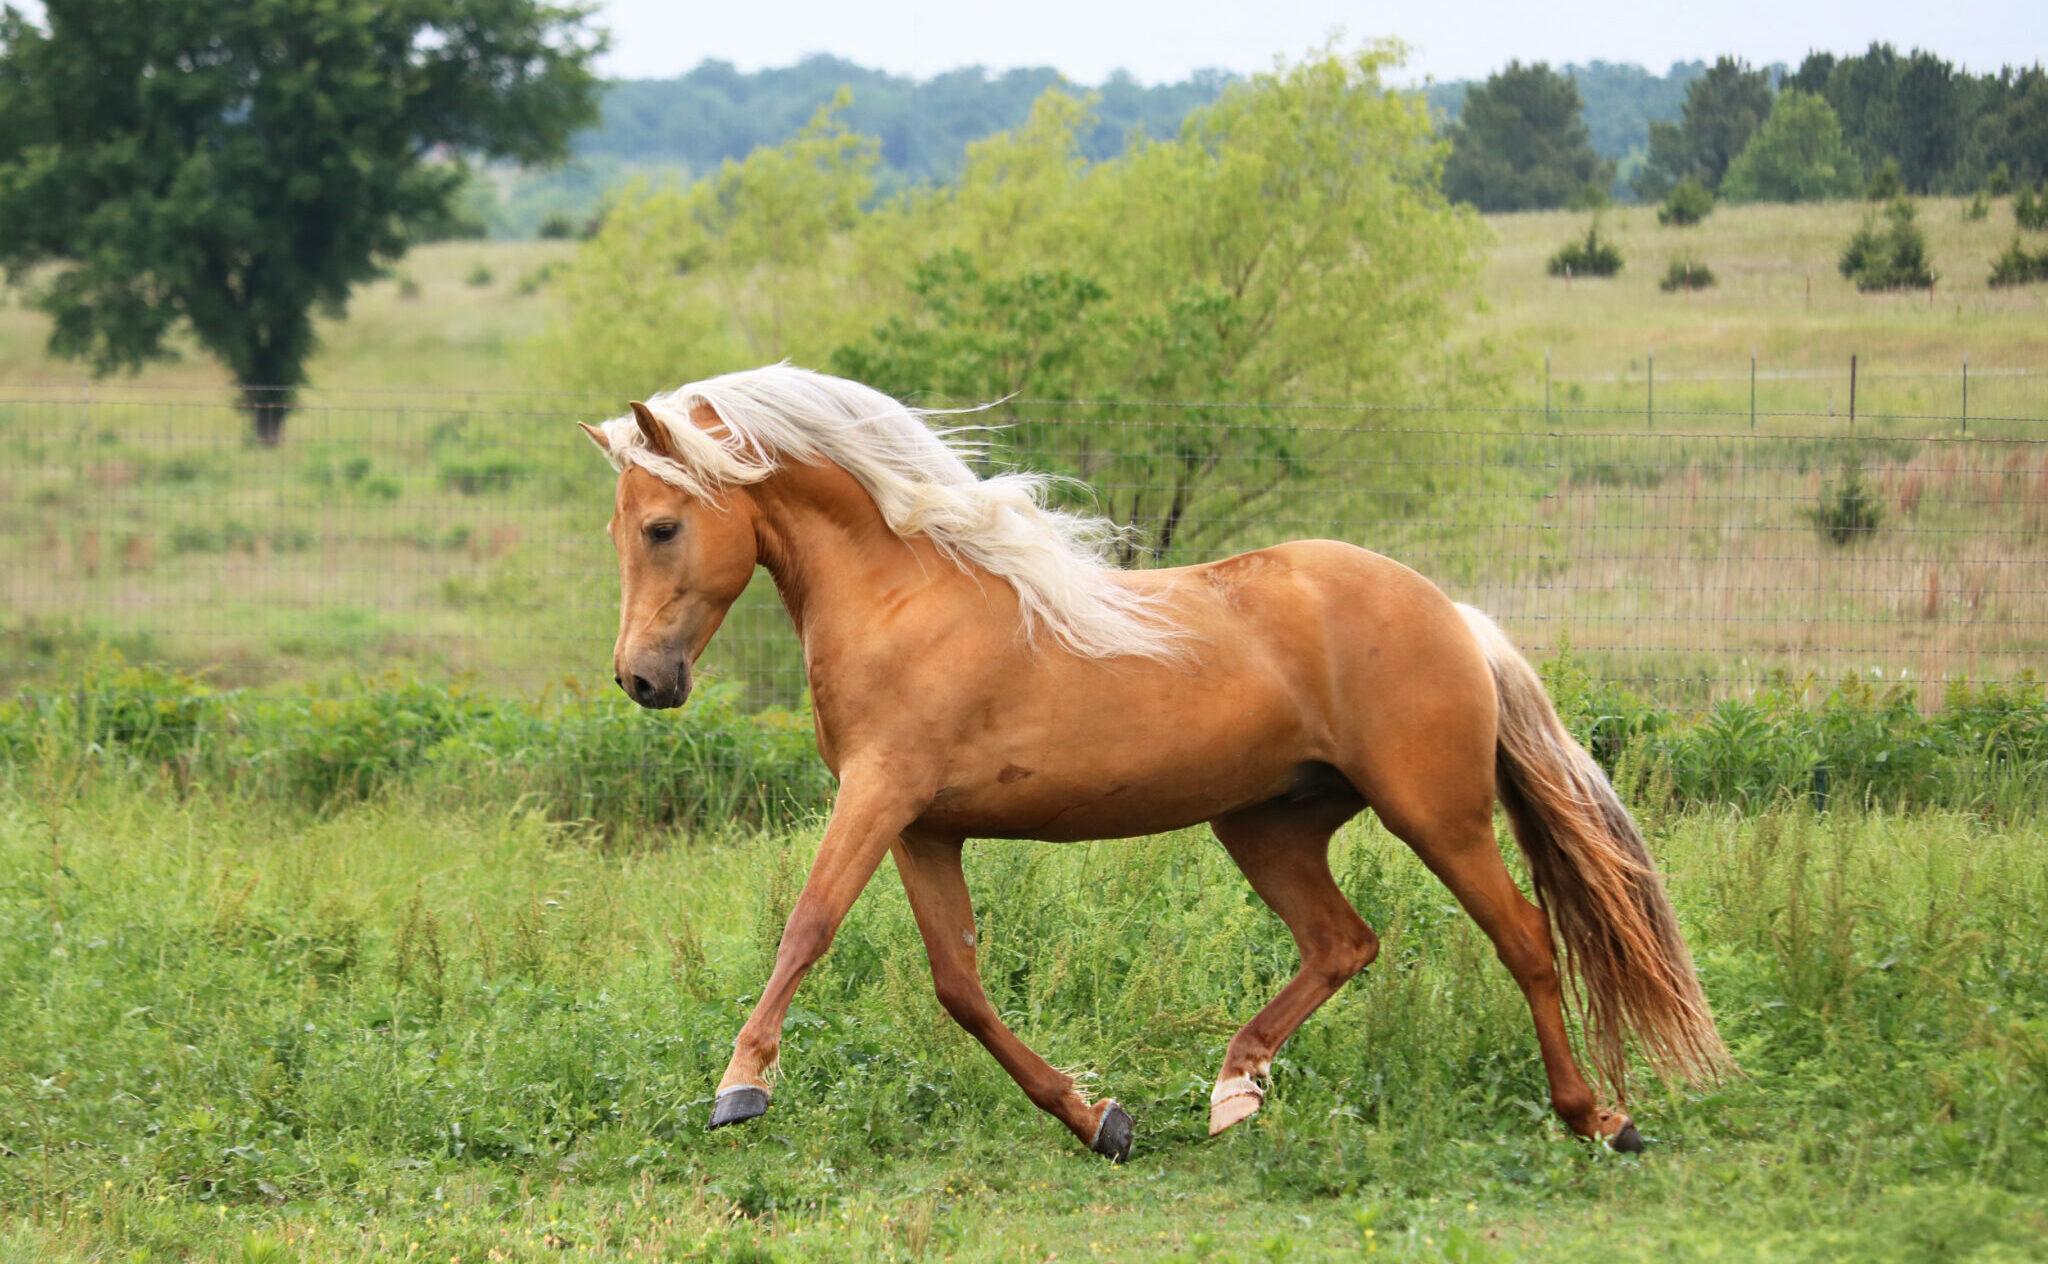 Horse Breed: Morgan - photo by Lisa Kolbenschlag/Shutterstock.com - Globetrotting horse riding holidays